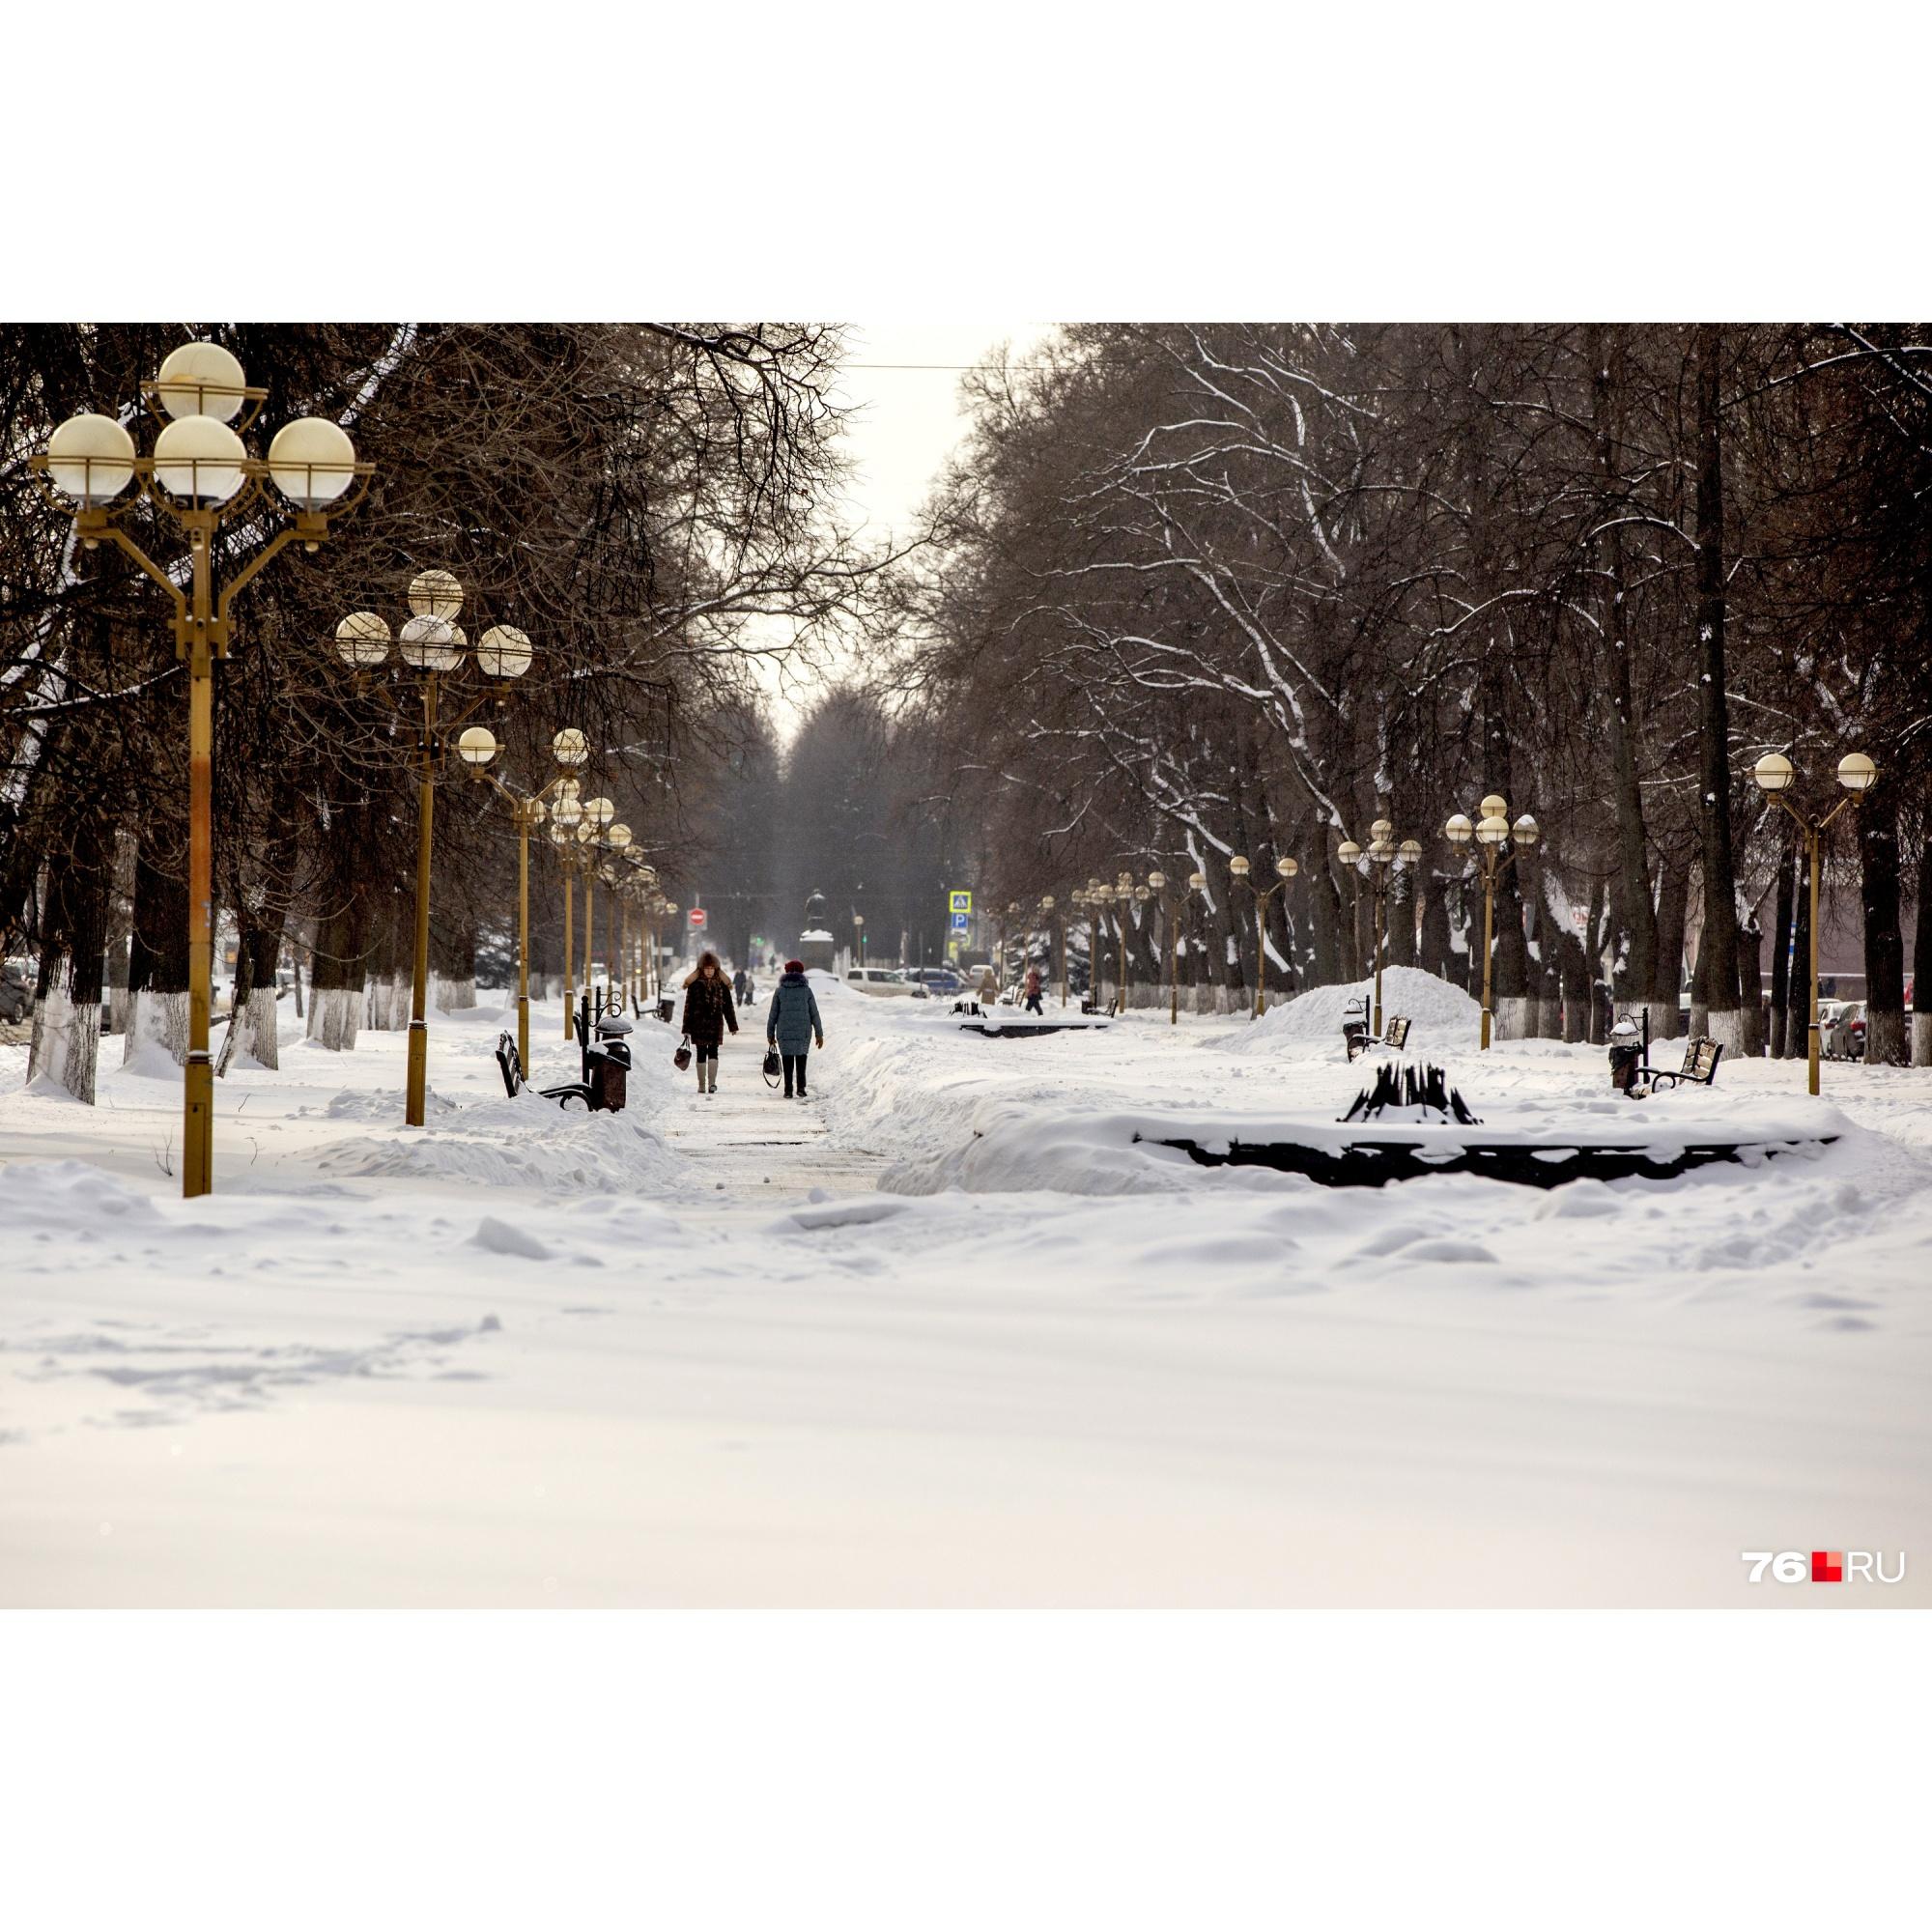 Бульвар на проспекте Ленина занесло снегом